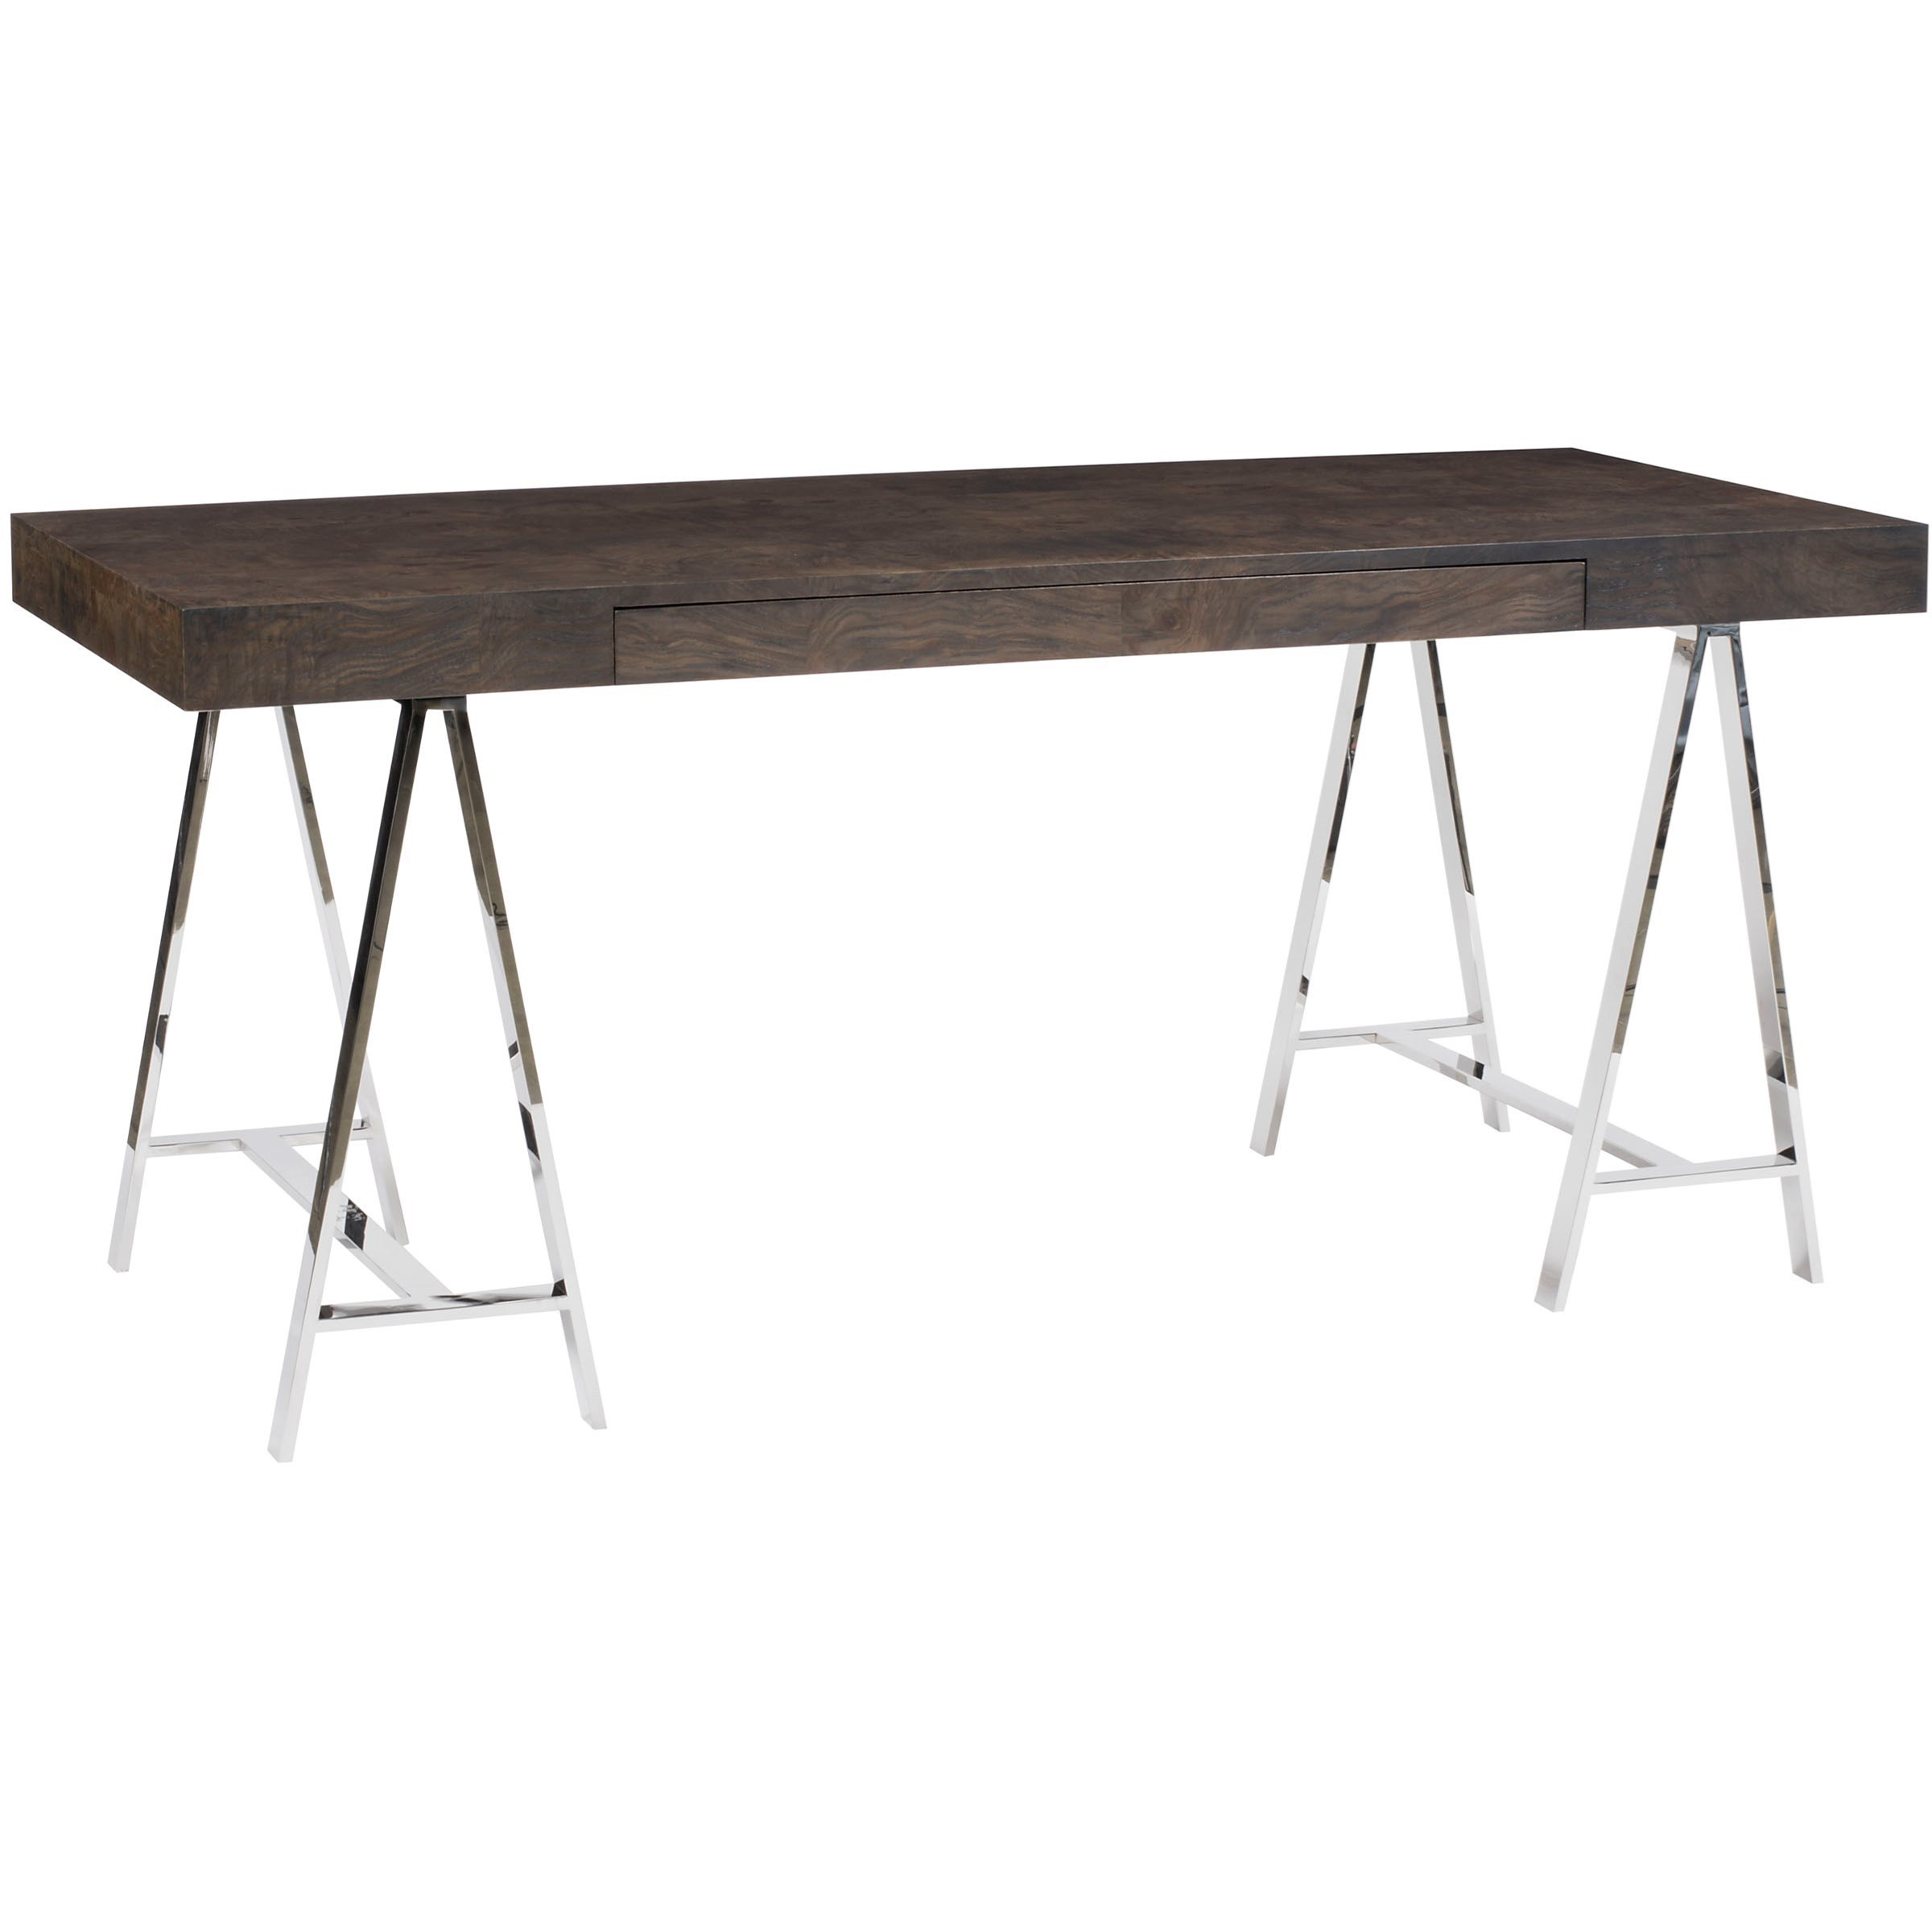 Michael Weiss Scribbner Desk by Vanguard Furniture at Baer's Furniture